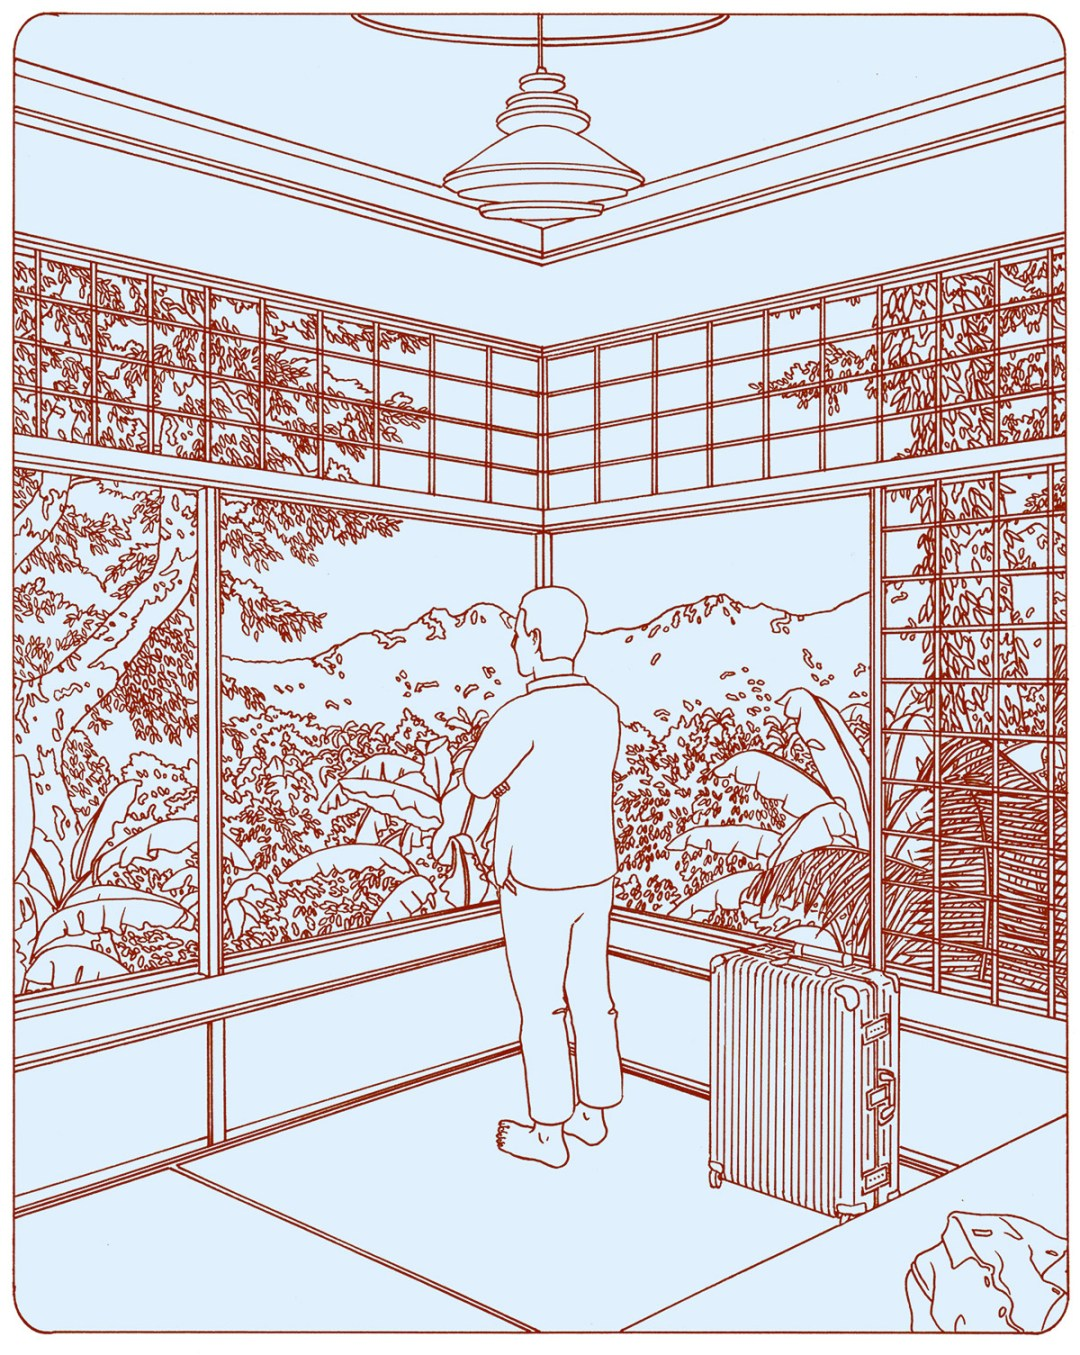 Illustrator Spotlight: Liam Cobb